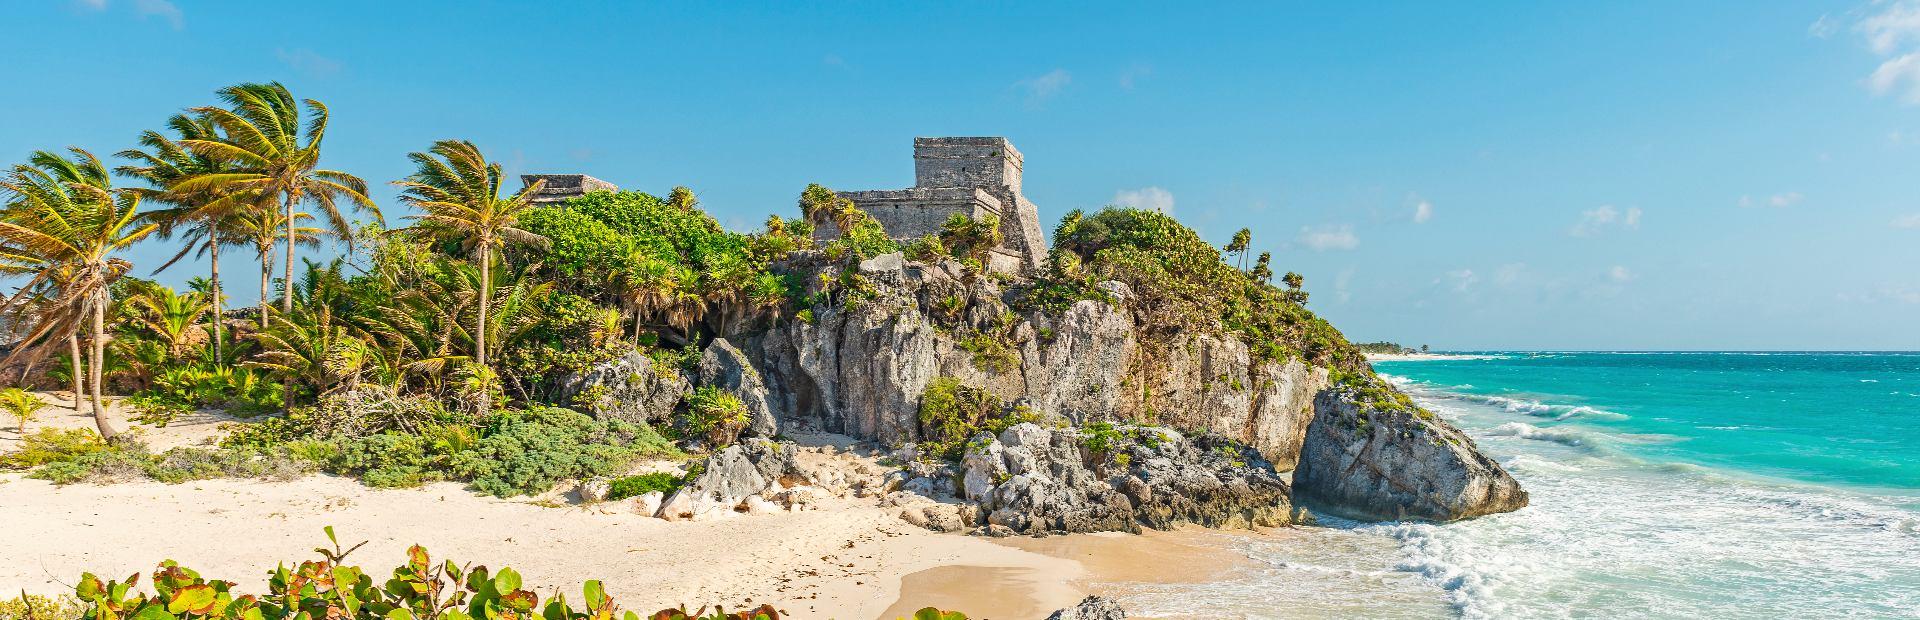 Mexico tempels en stranden